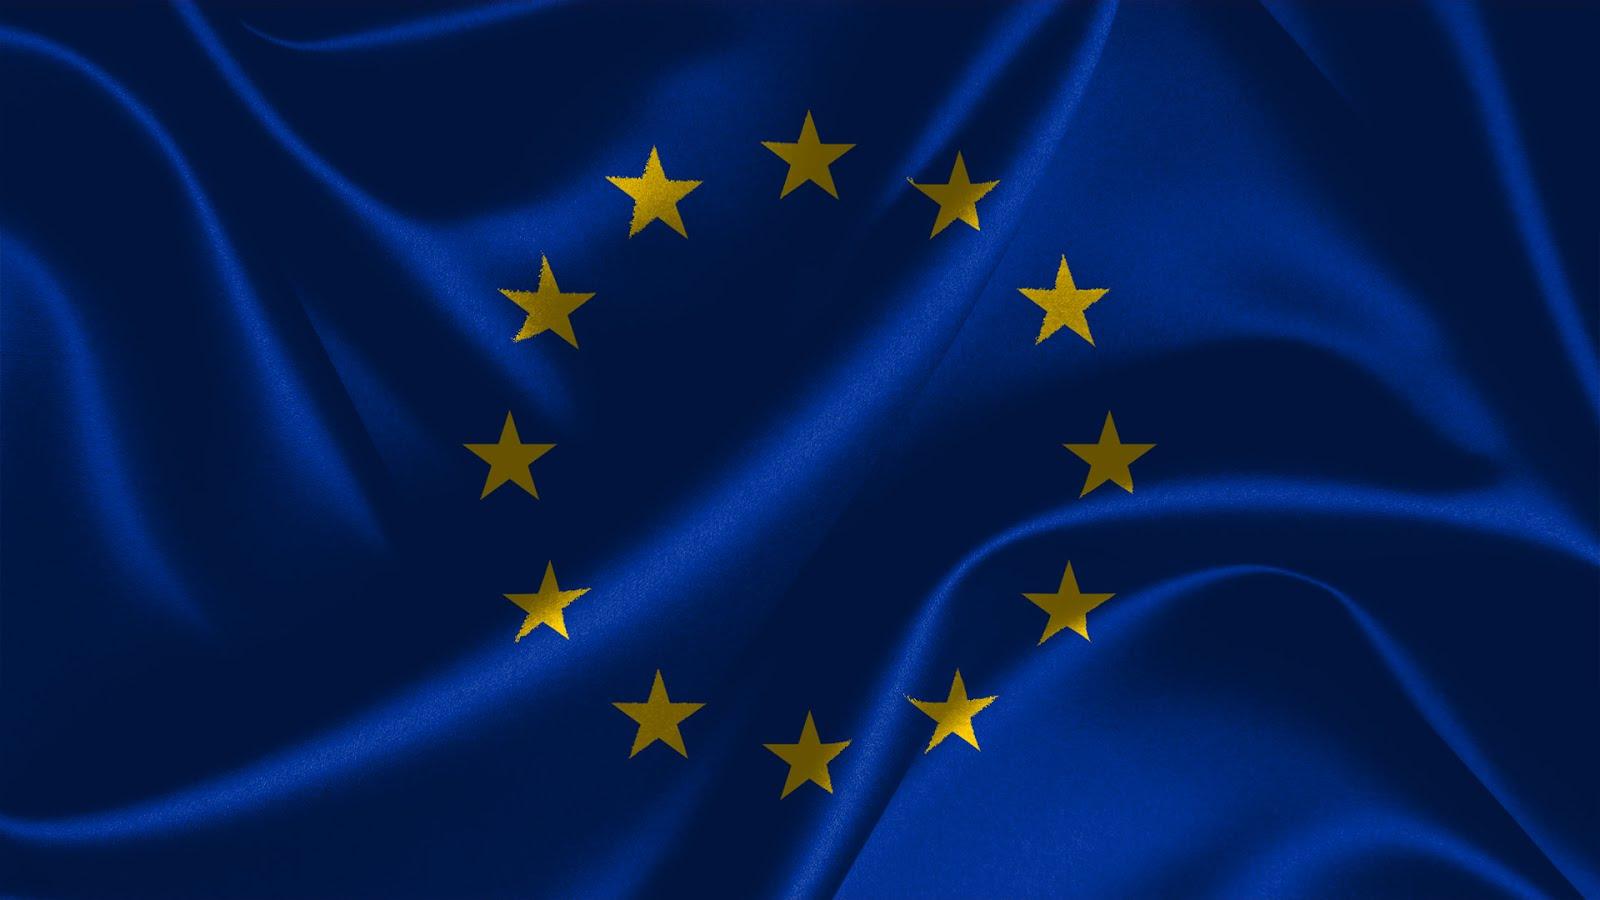 Europa - Unser Zuhause